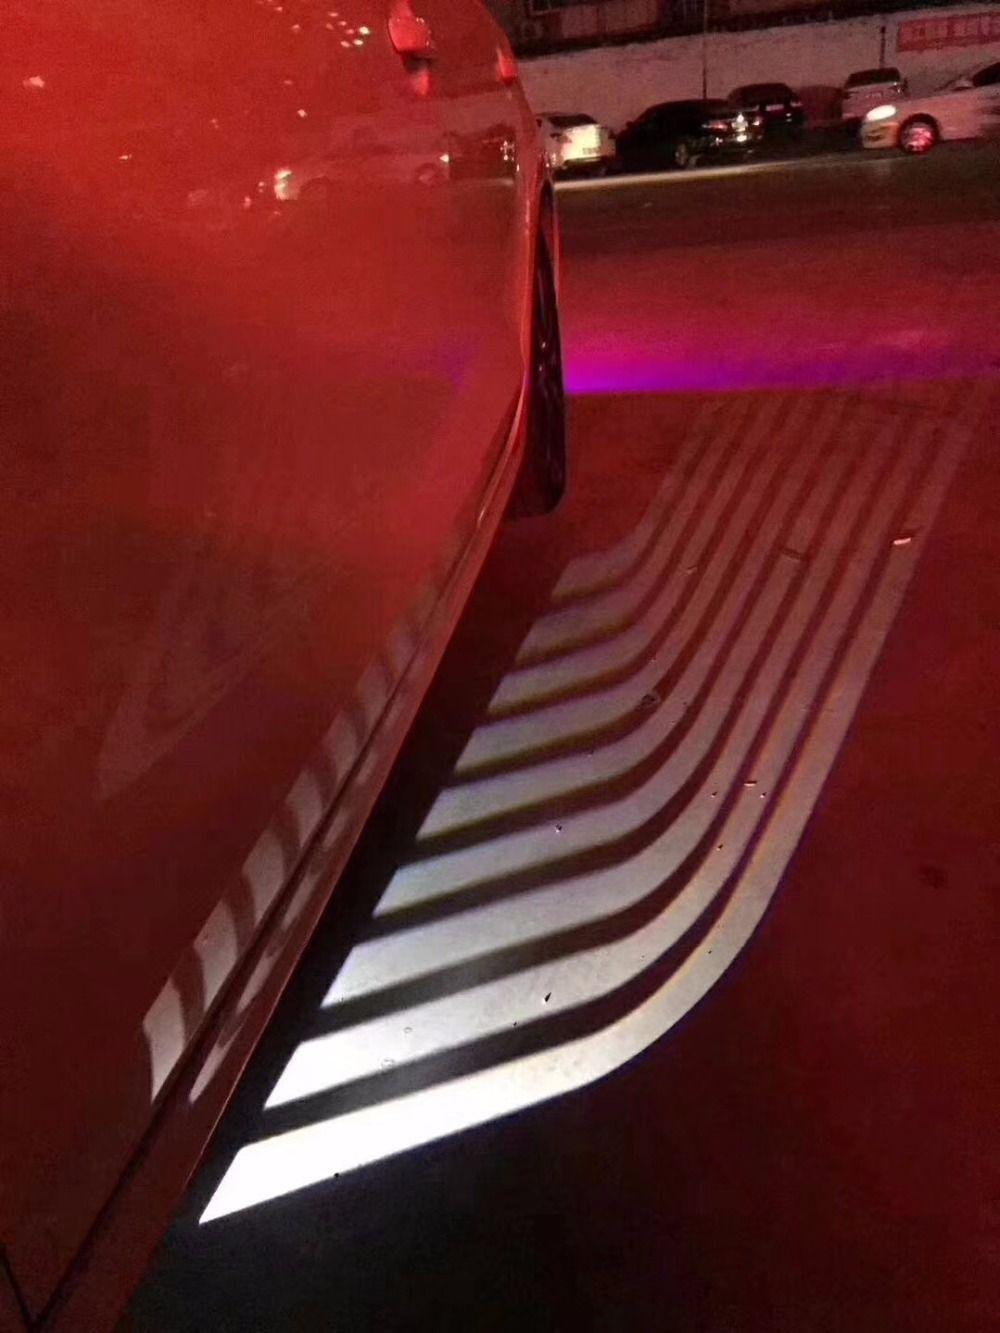 eOsuns led welcome lamp ground light for Subaru B9 Tribeca Baja BRZ Forester Impreza Justy Legacy Liberty Outback Loyale SVX